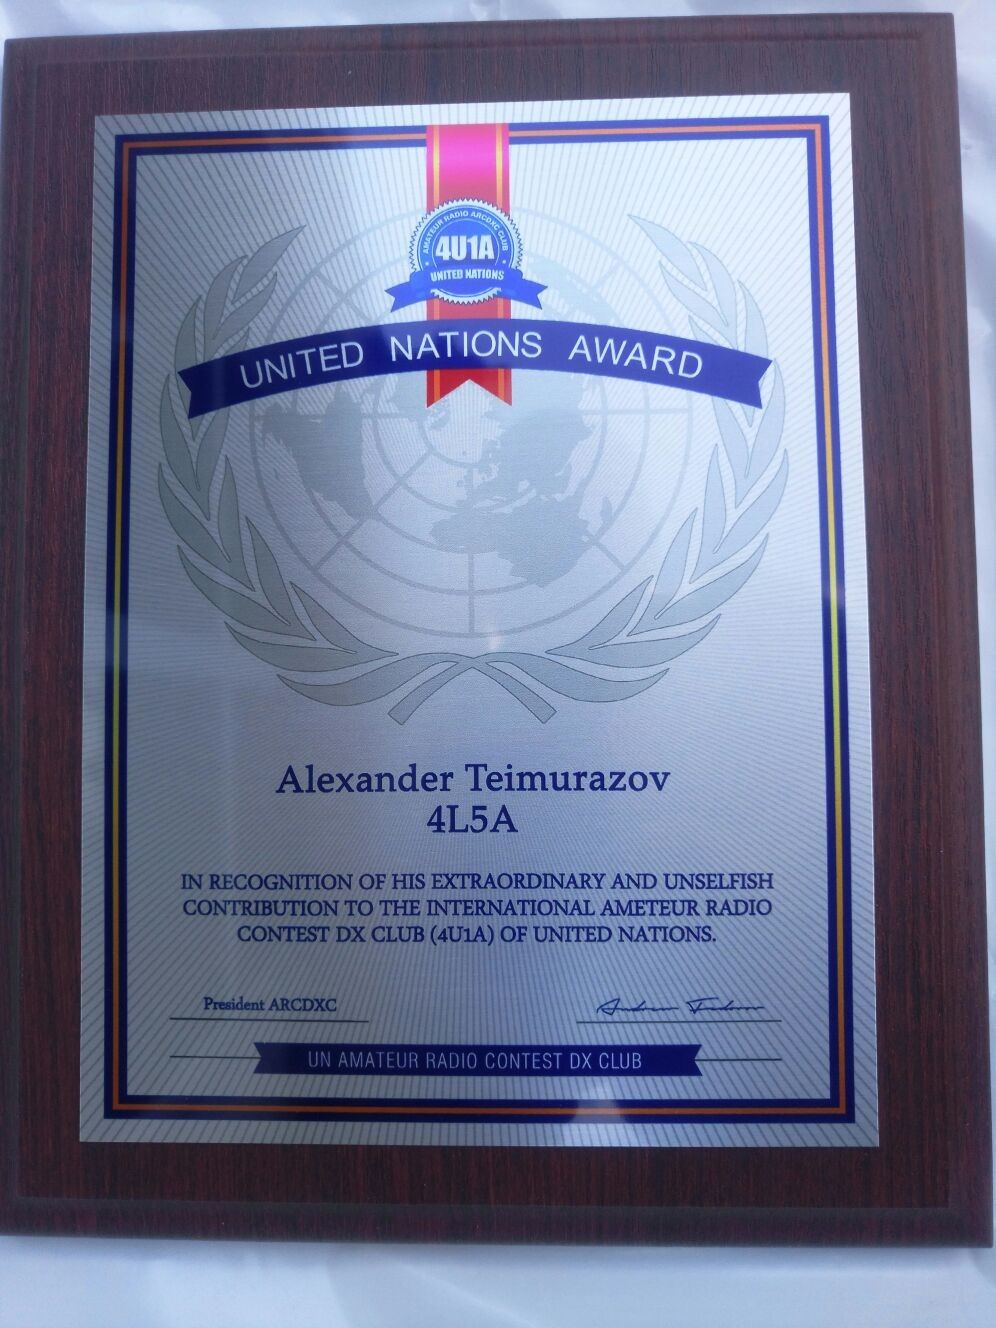 4U1A Plaque 4L5A Alexander Teimurazov